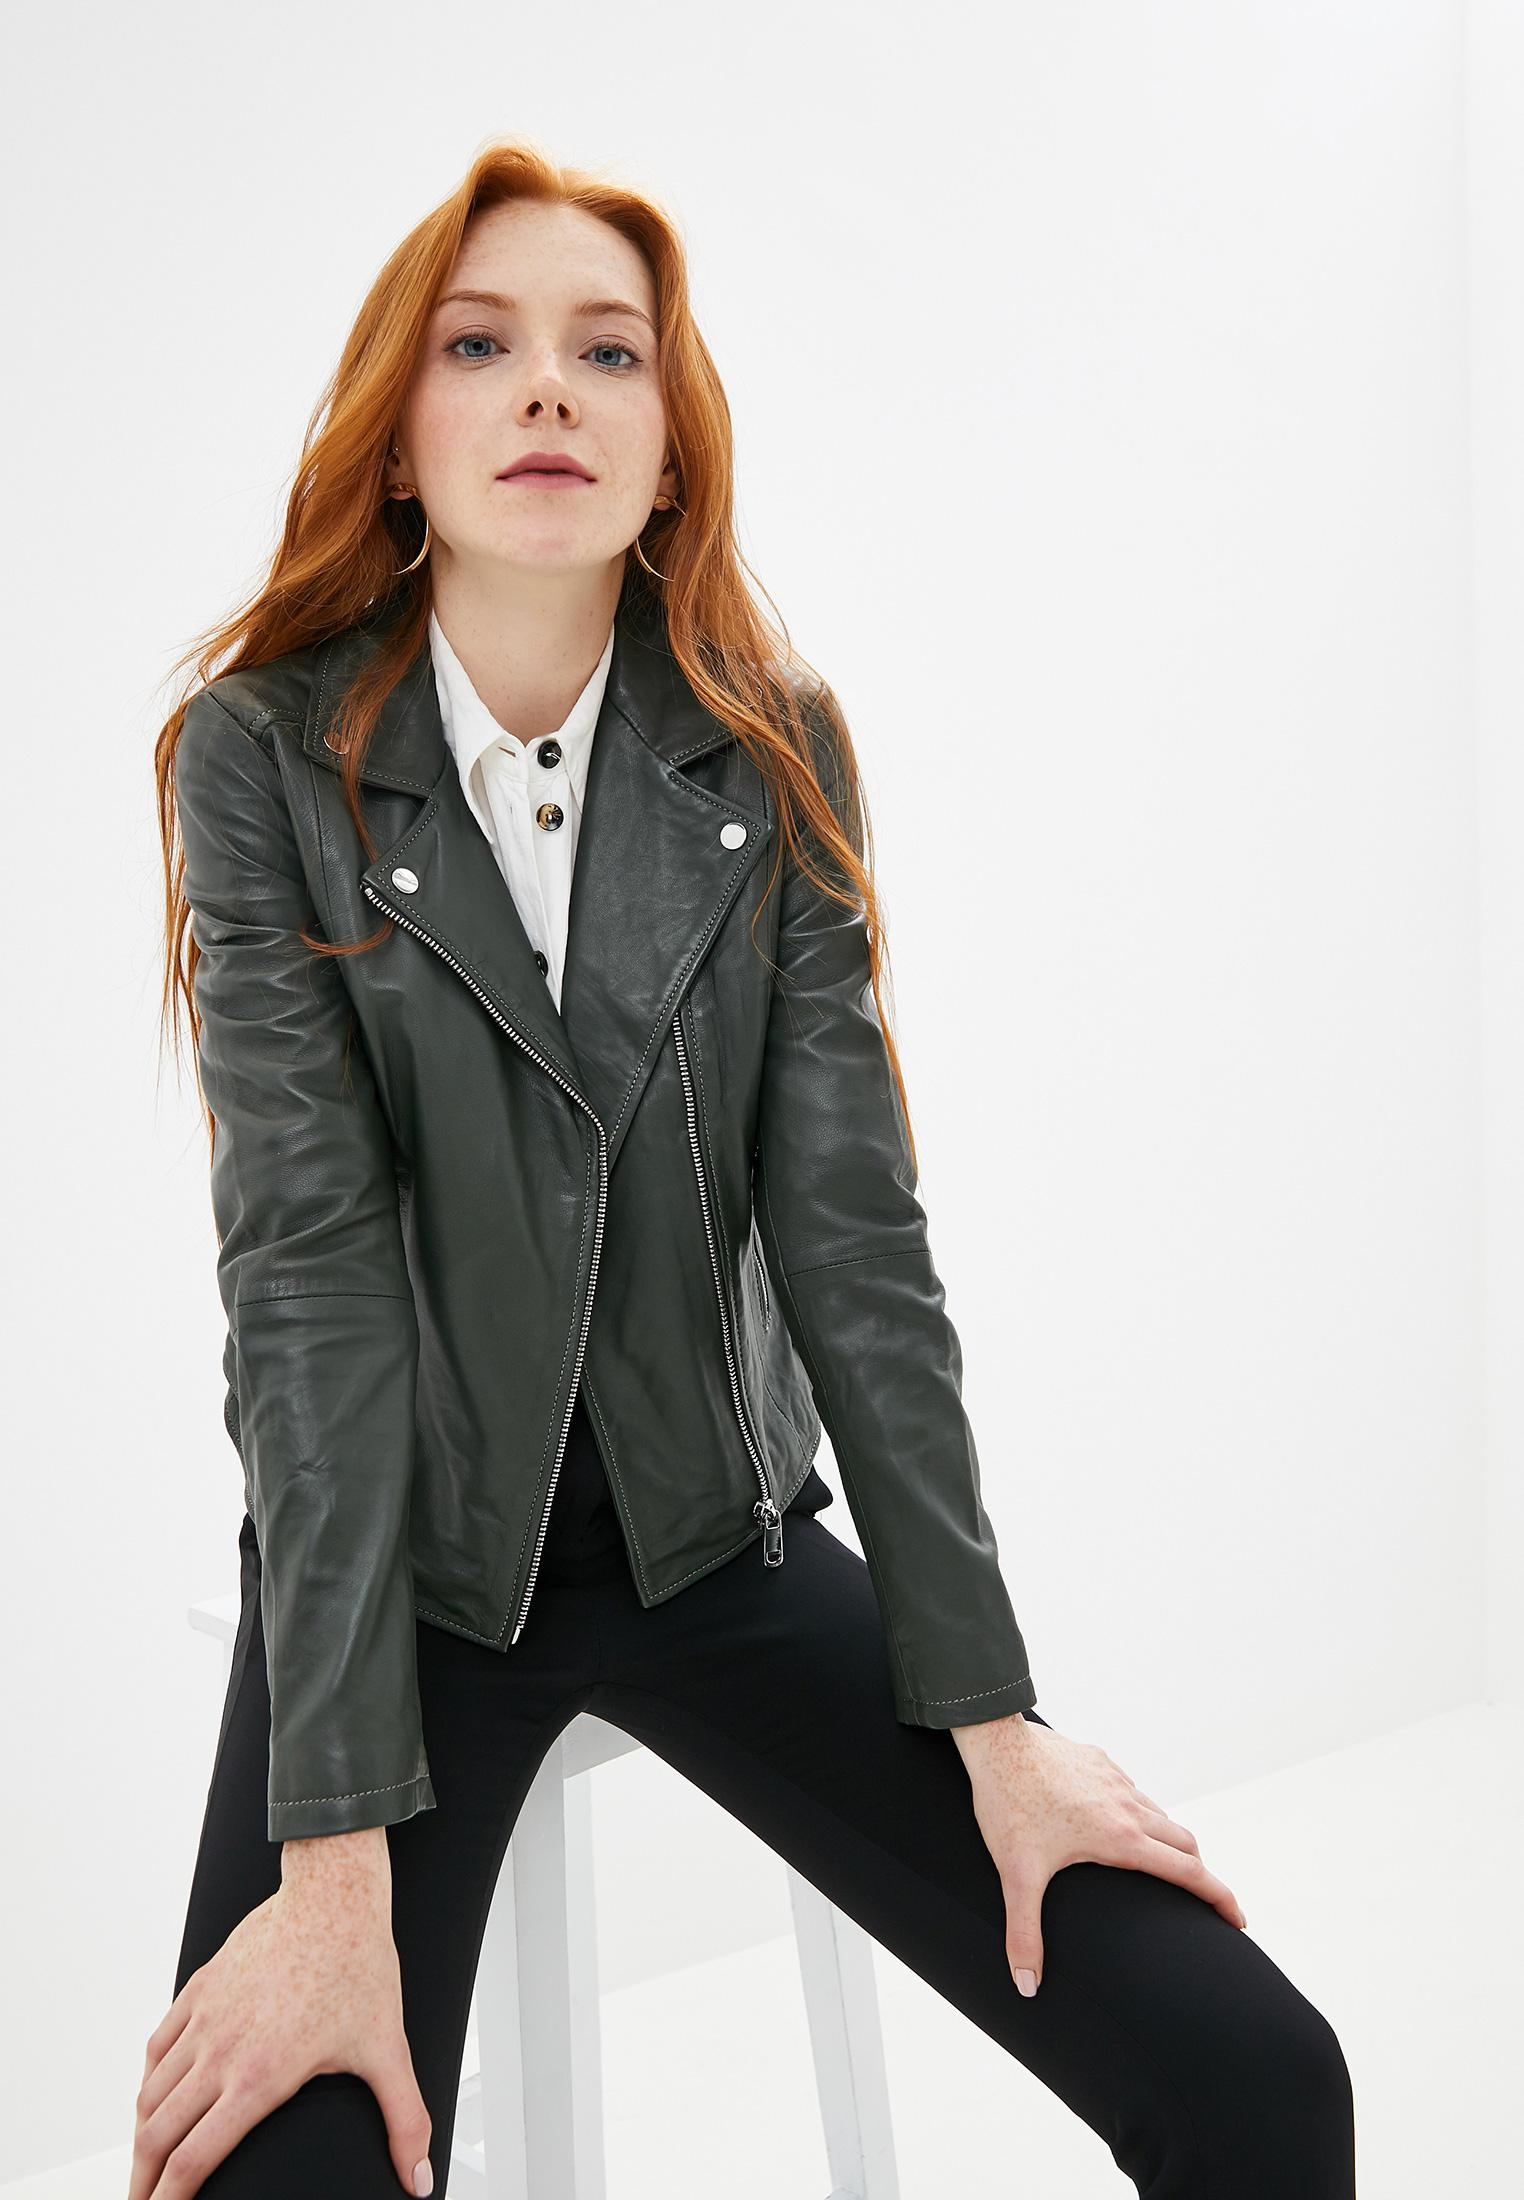 Куртка кожаная, La Reine Blanche, цвет: хаки. Артикул: MP002XW125JY. Одежда / Верхняя одежда / Косухи